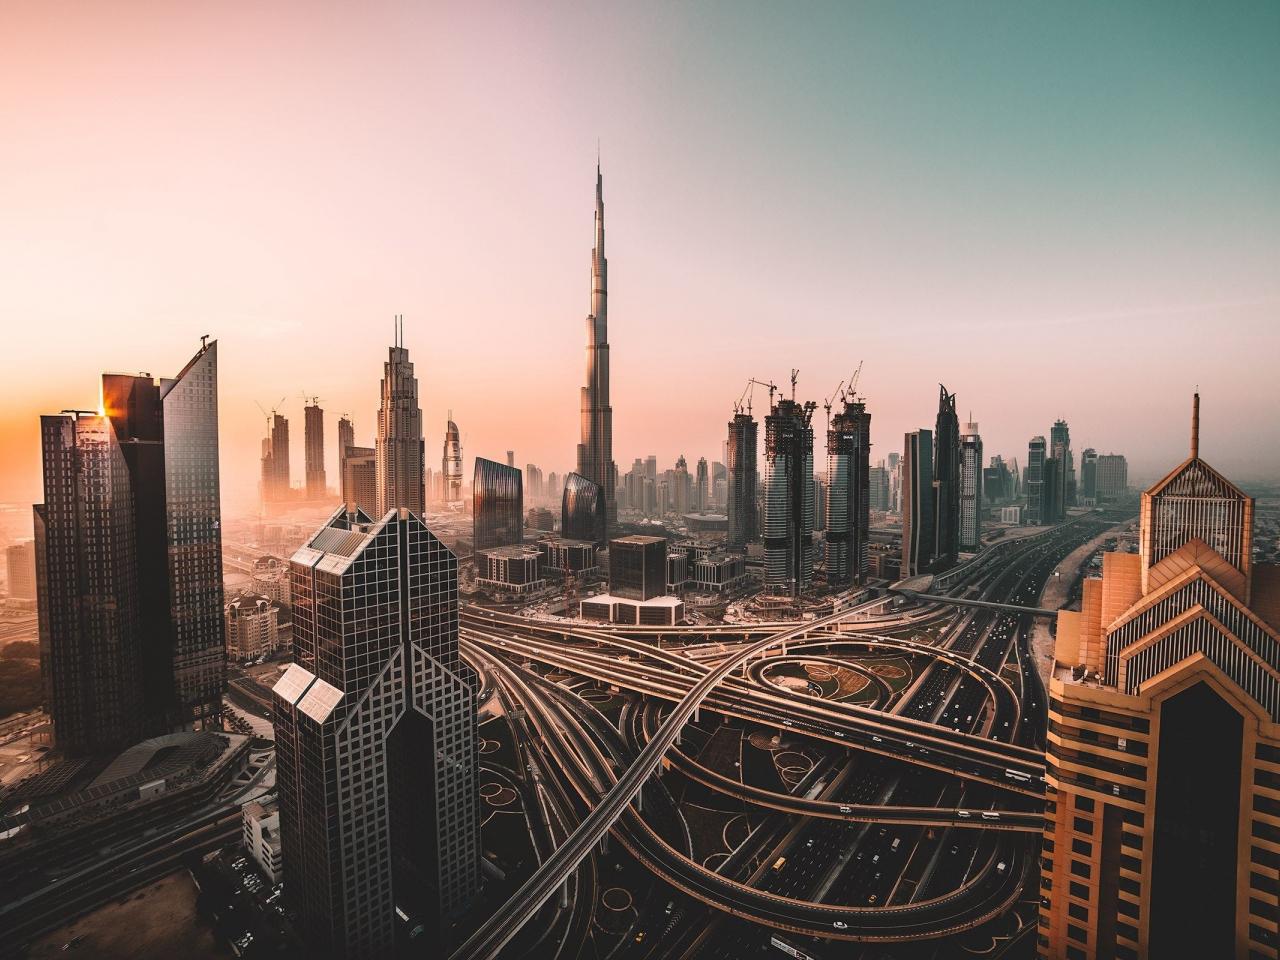 Dubai, skyline, cityscape, skyscrapers, buildings, Burj Khalifa, city, 1280x960 wallpaper